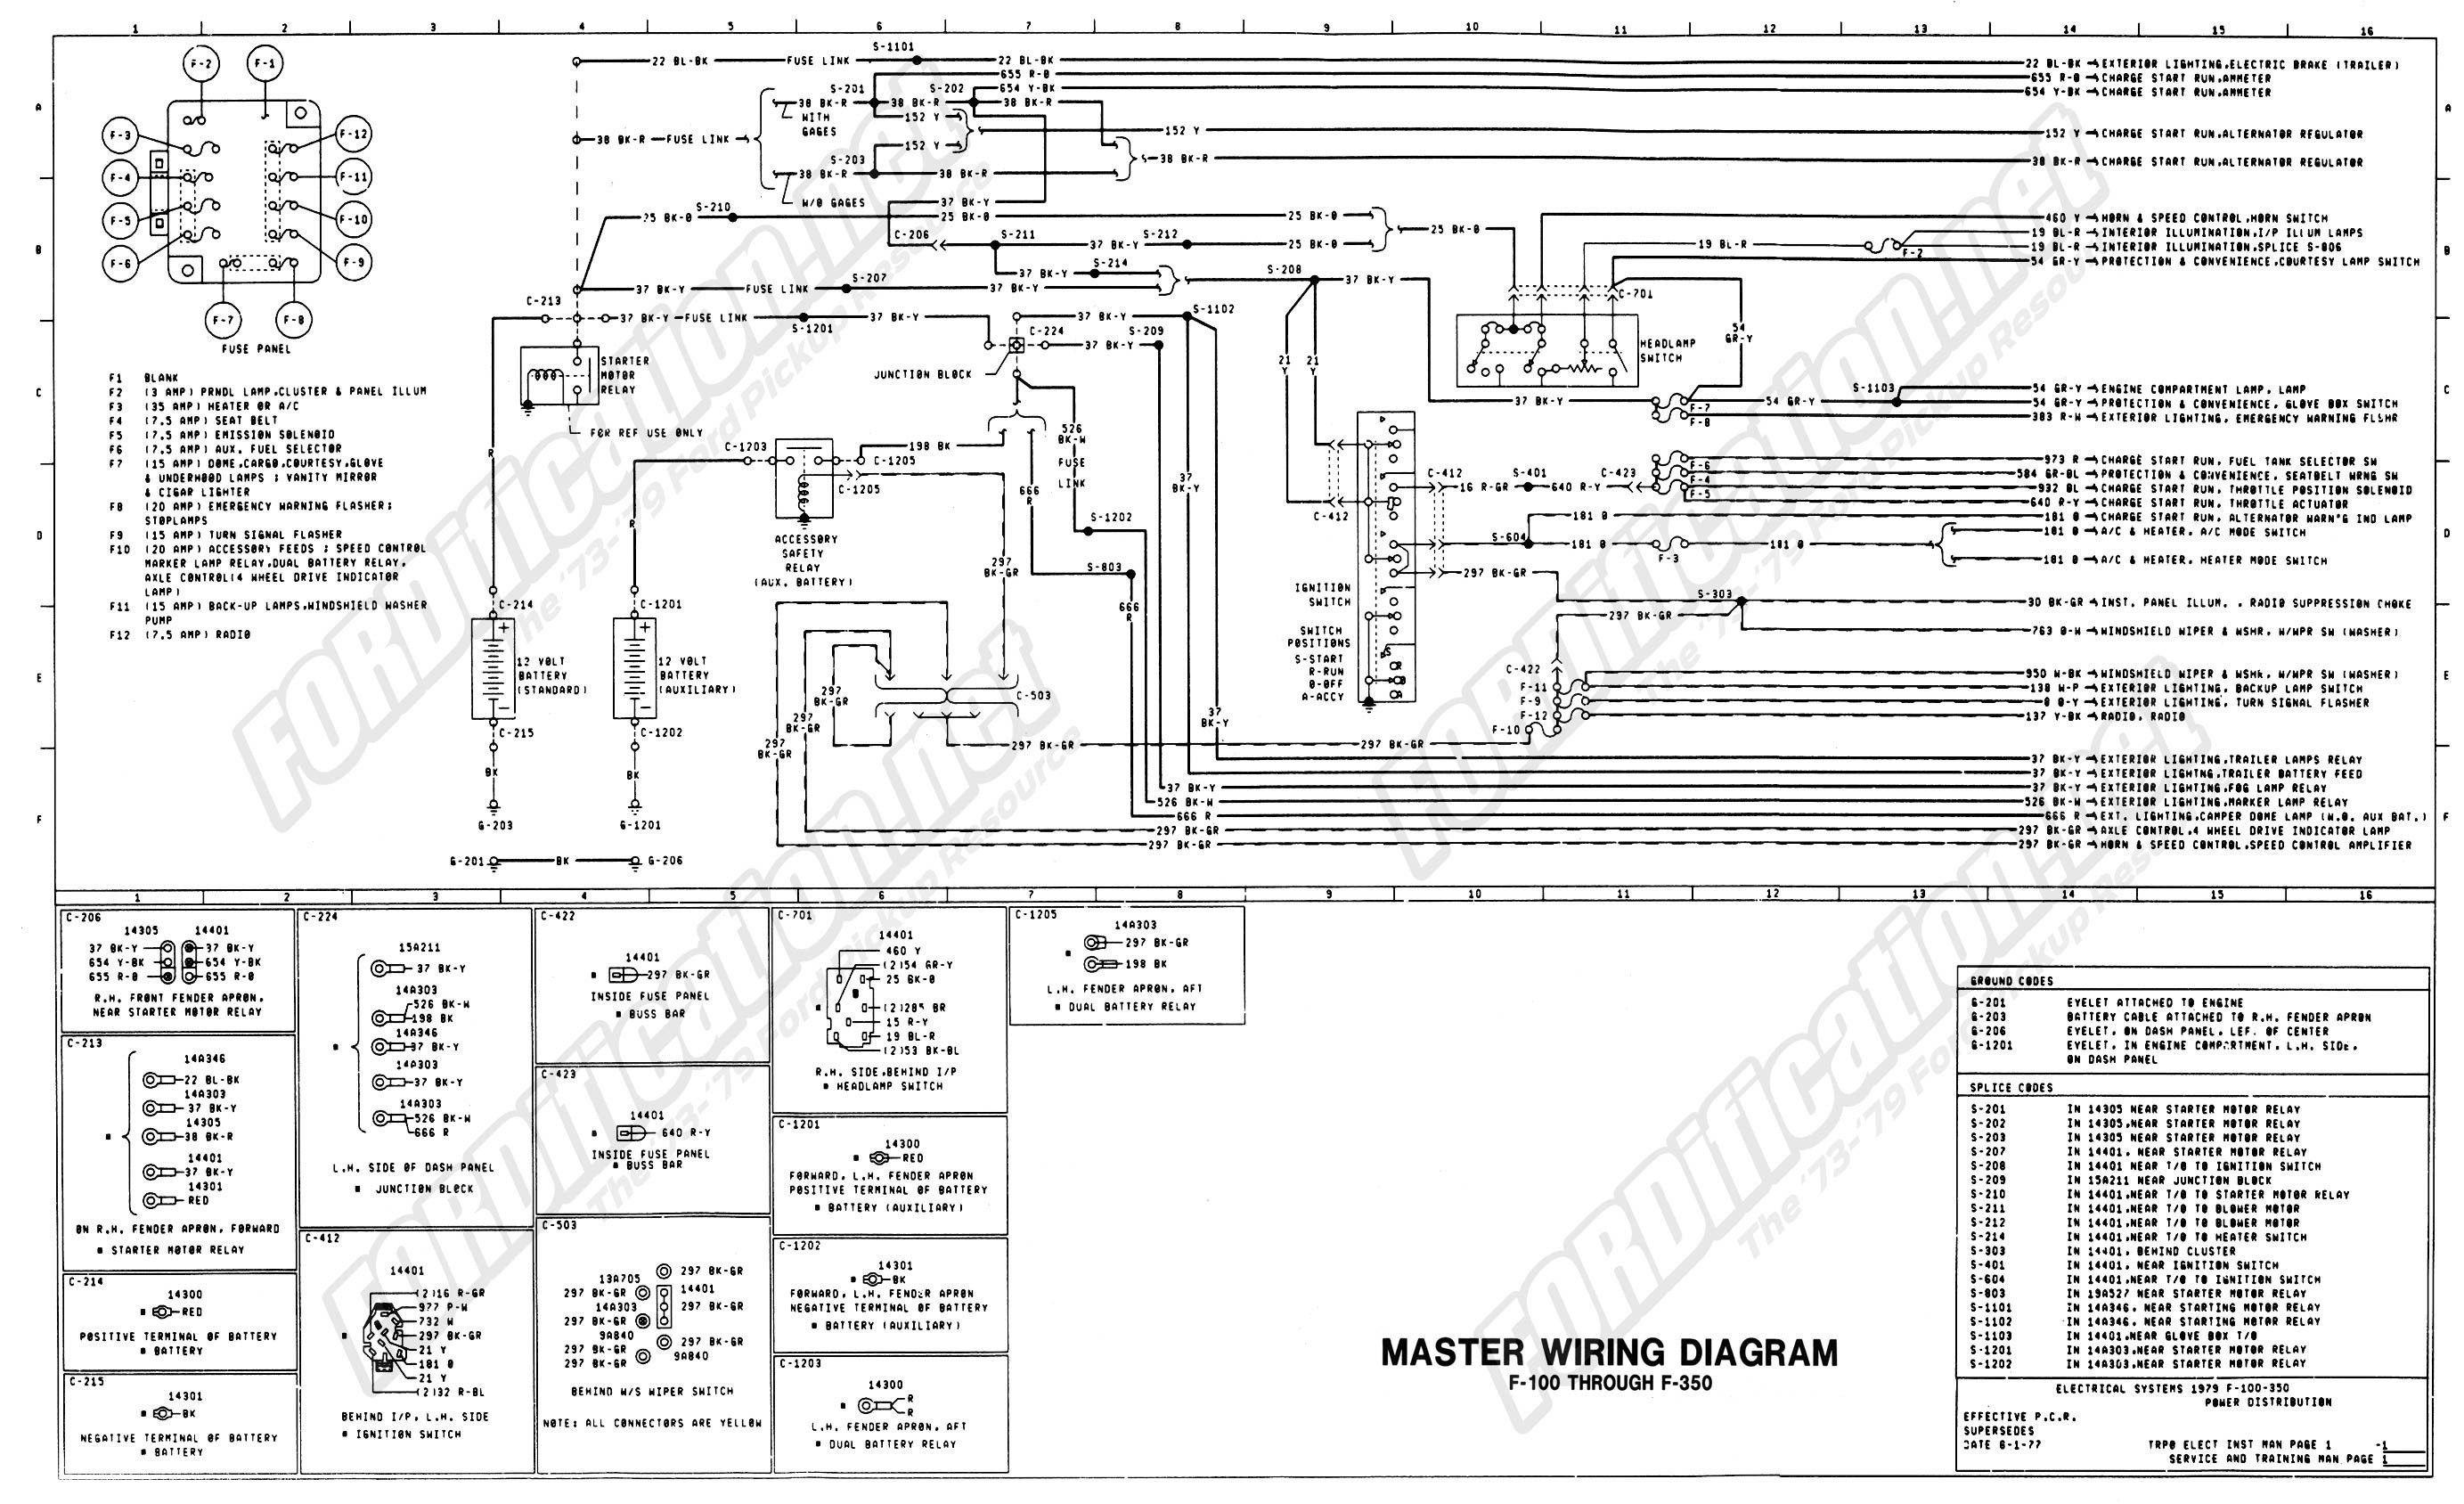 New 2004 Dodge Ram 1500 Ignition Wiring Diagram #diagram #